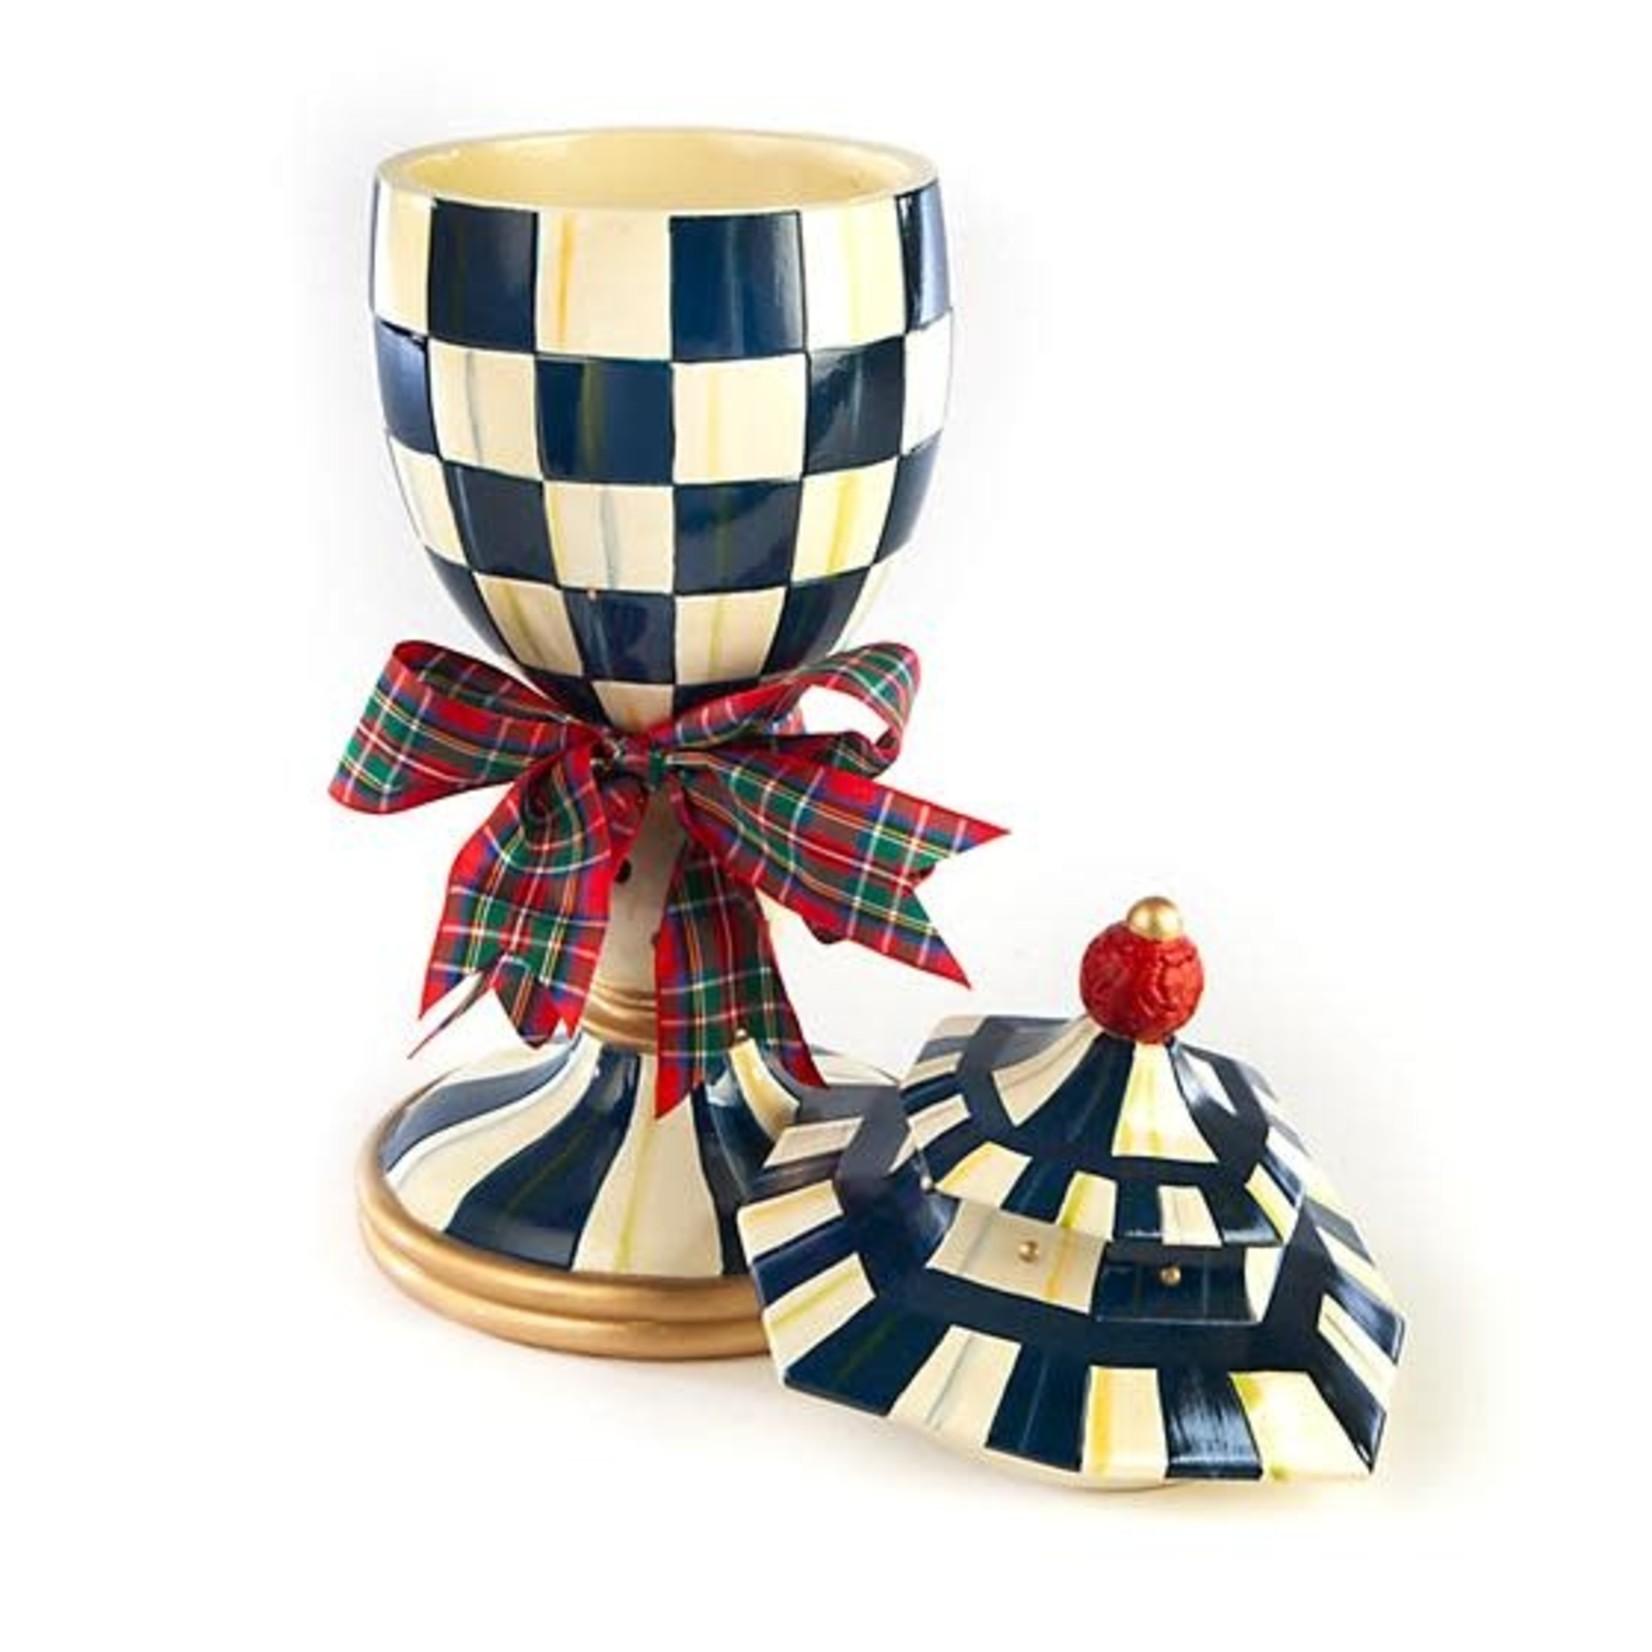 MacKenzie Childs Royal Check Lidded Urn - Large